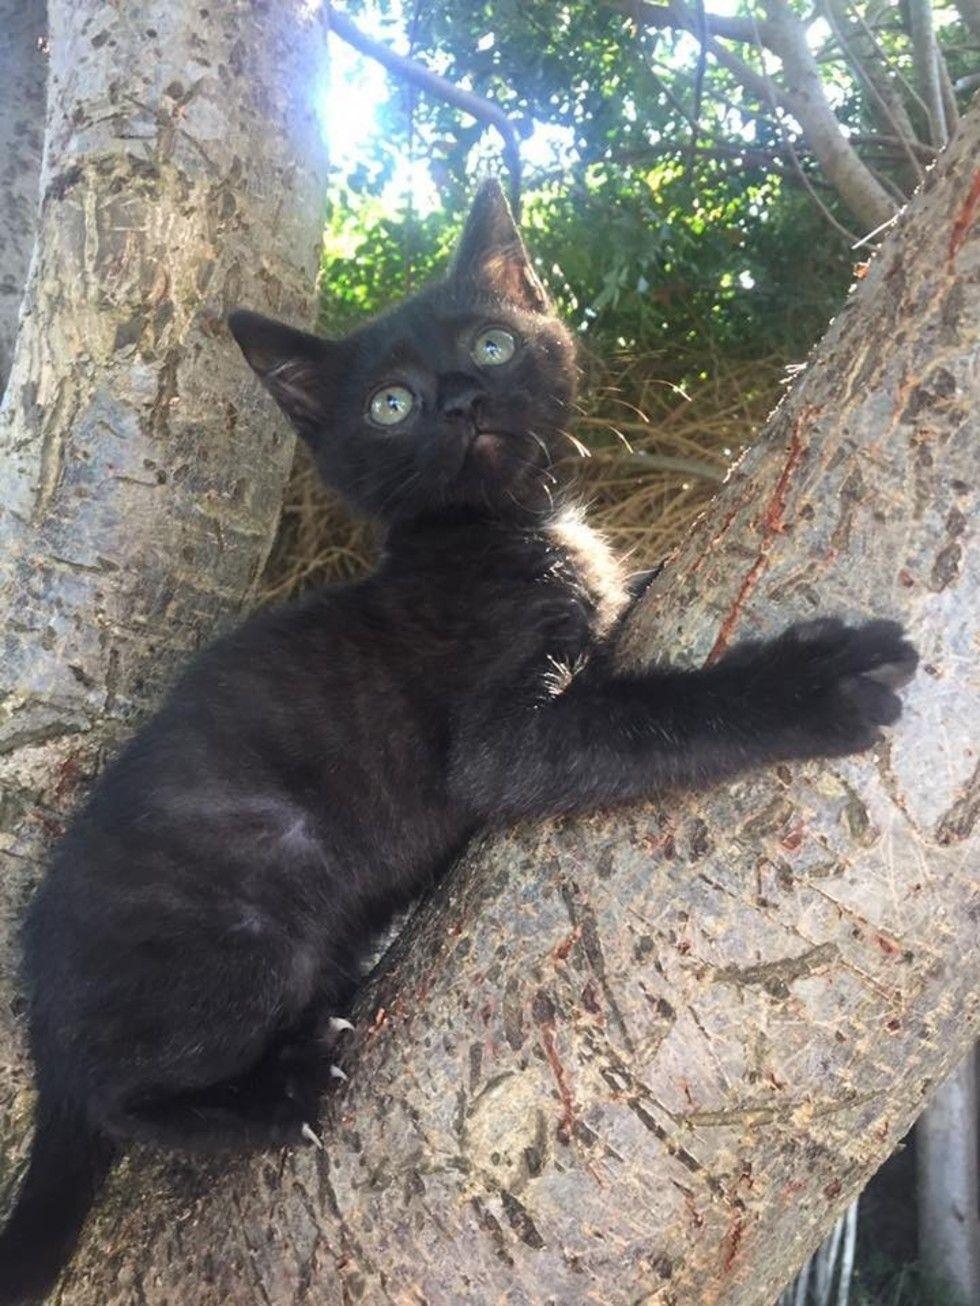 Kitten Found In Wooden Reel Survives Despite Having No Food And Water For Days Kitten Kitten Rescue Tiny Kitten